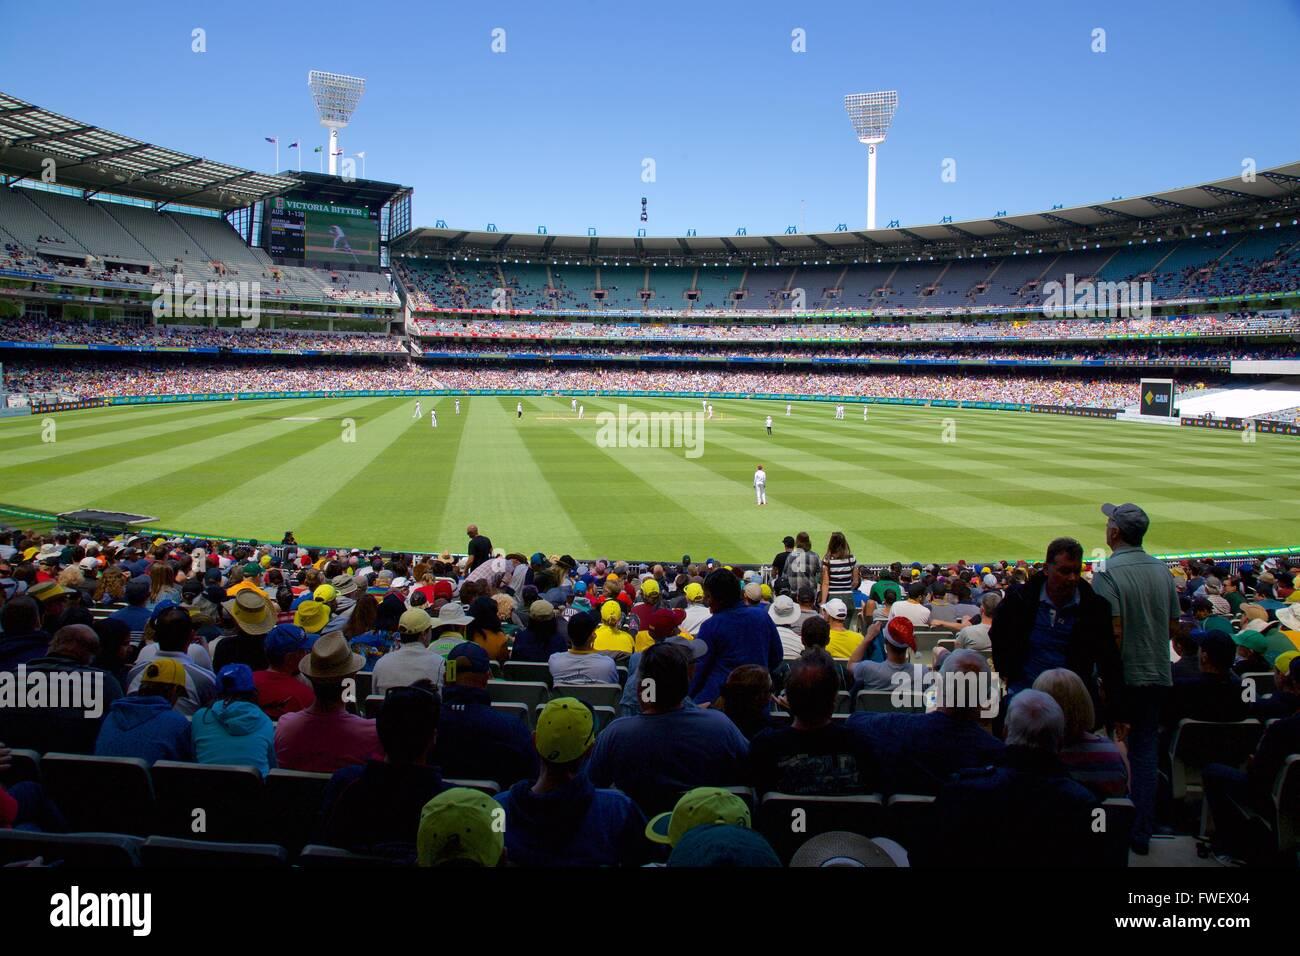 Melbourne Cricket Ground Test Match, Melbourne, Victoria, Australia, Oceania Immagini Stock